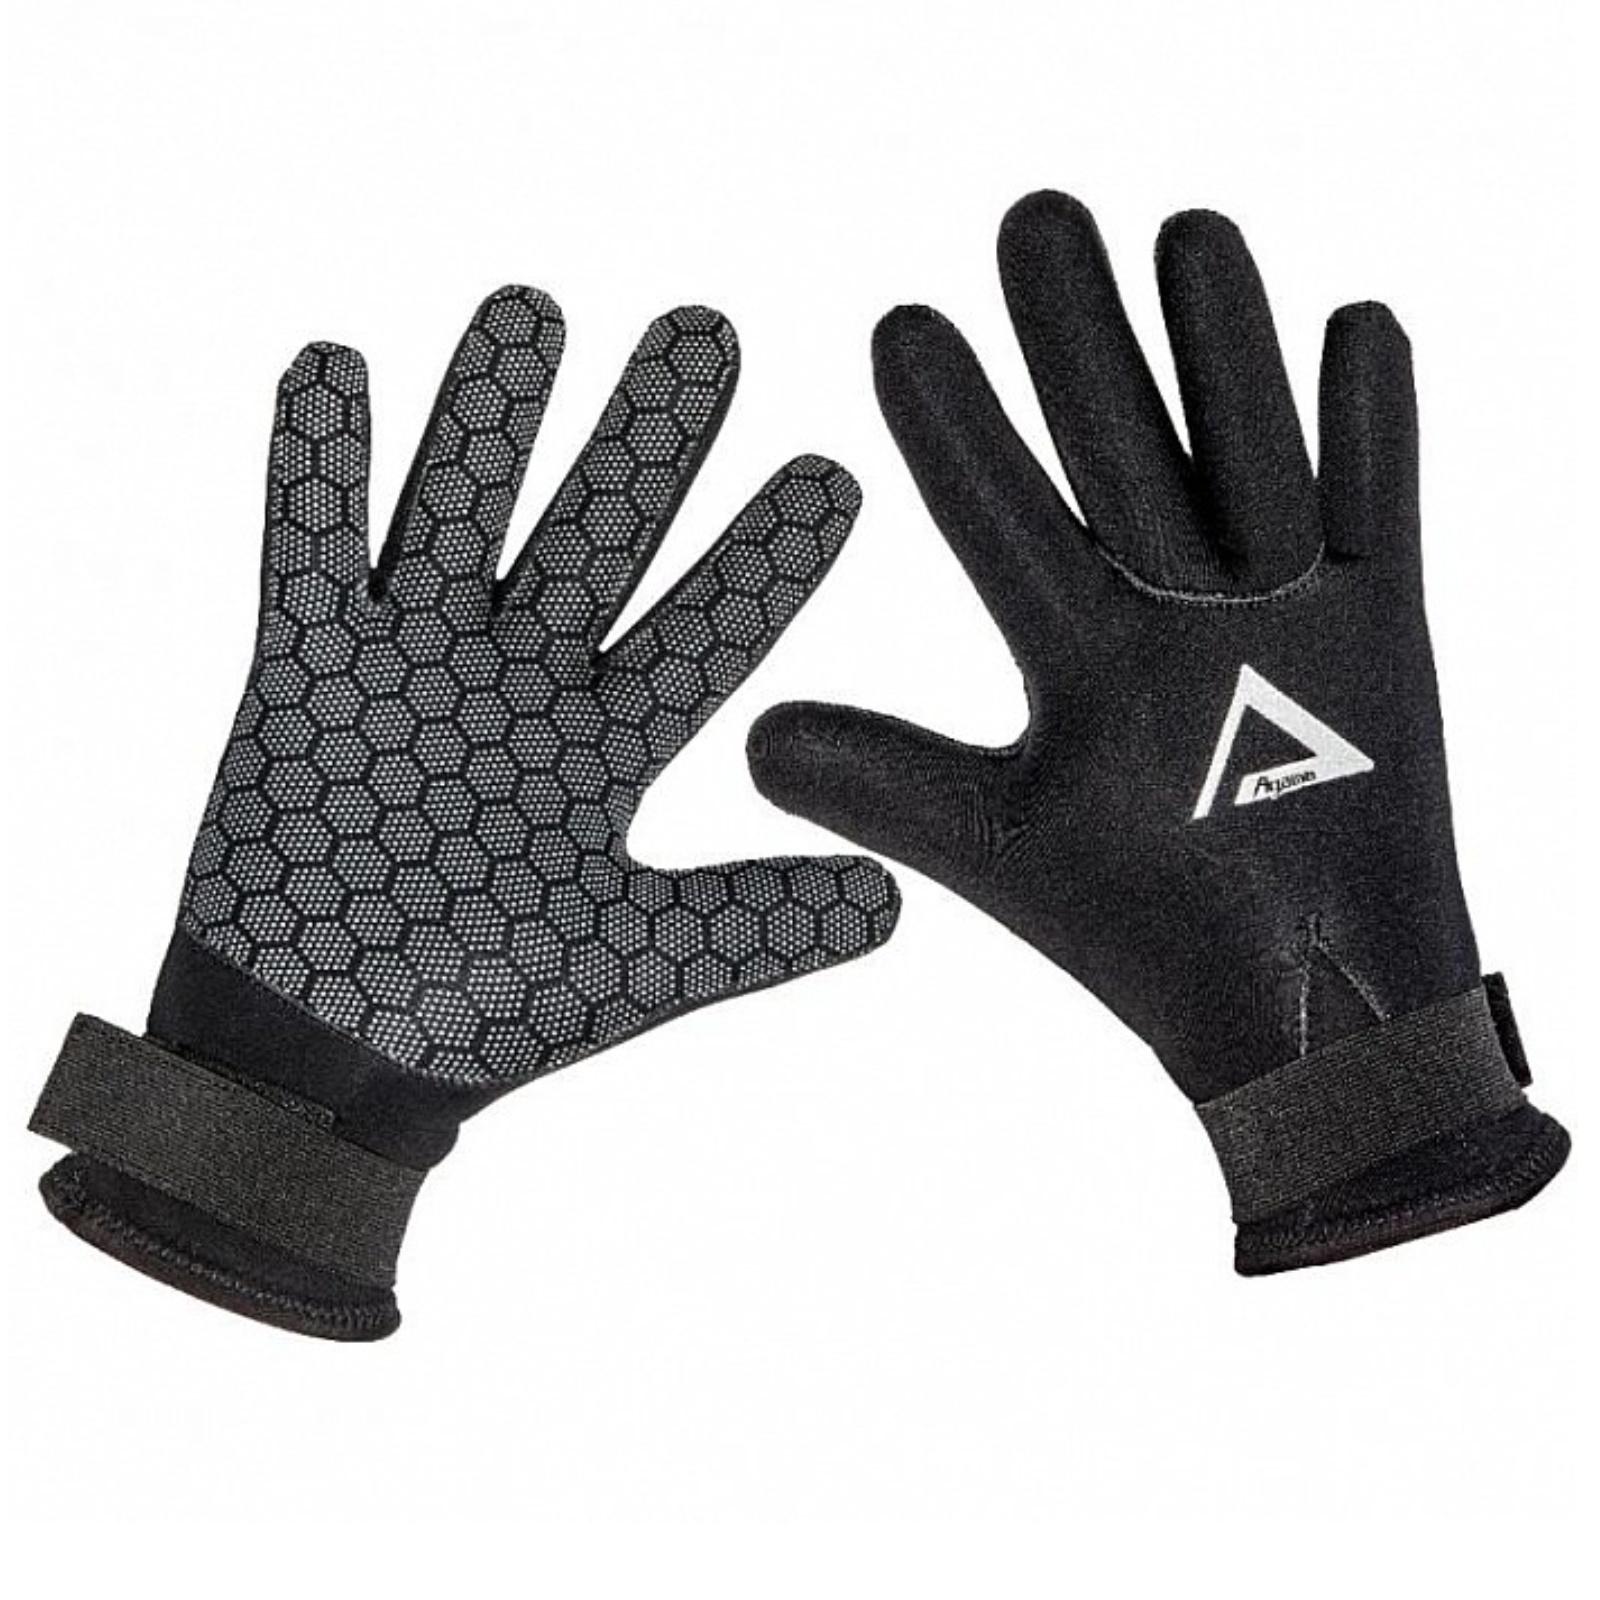 Neoprenové rukavice AGAMA Superstretch 5 mm - vel. M